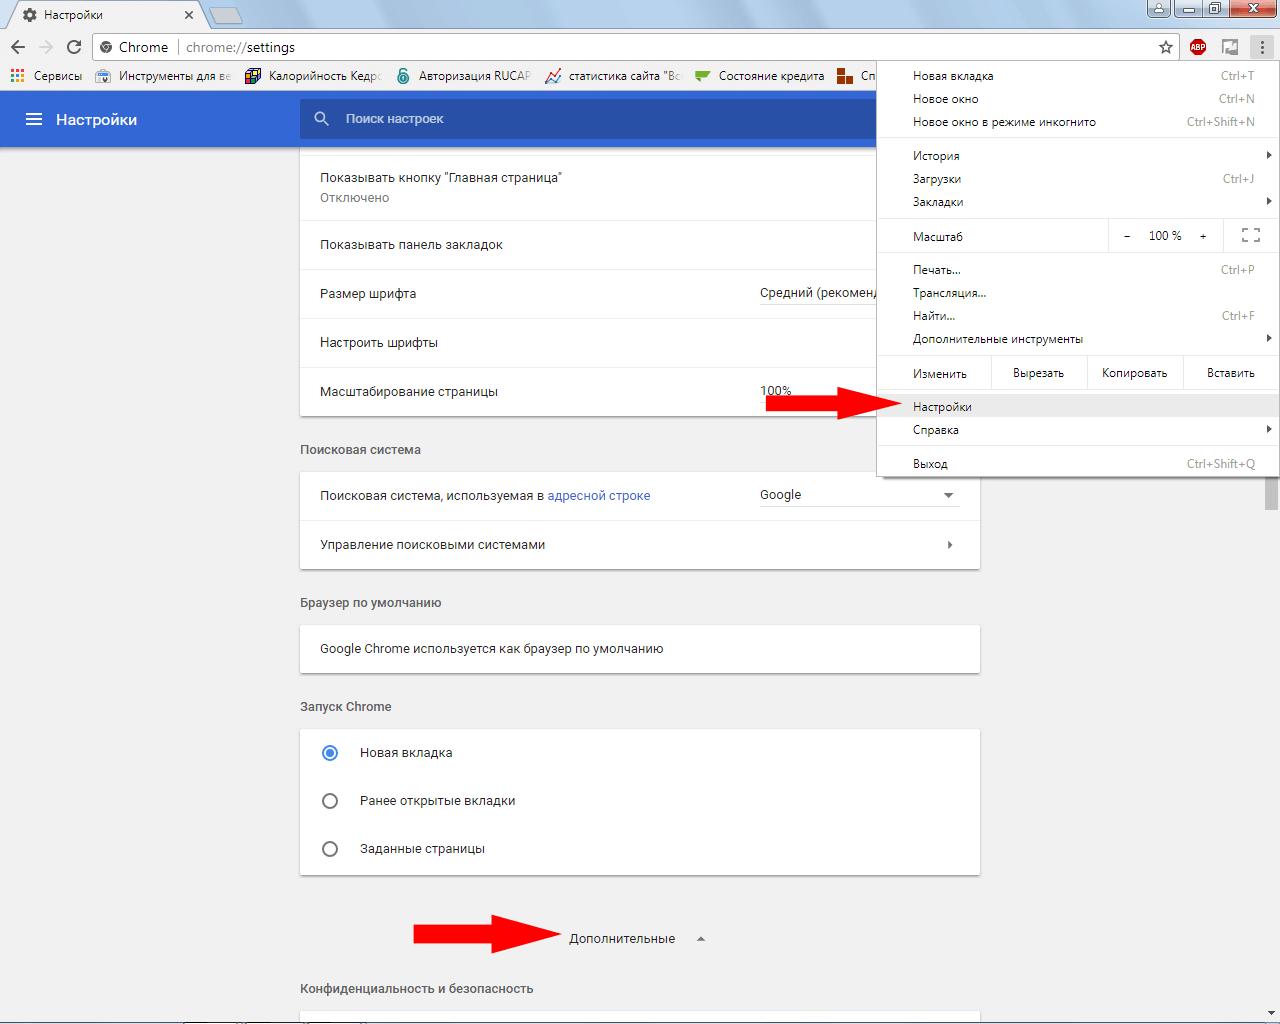 Как назначить Chrome браузером по умолчанию - Android. - Google Chrome 5